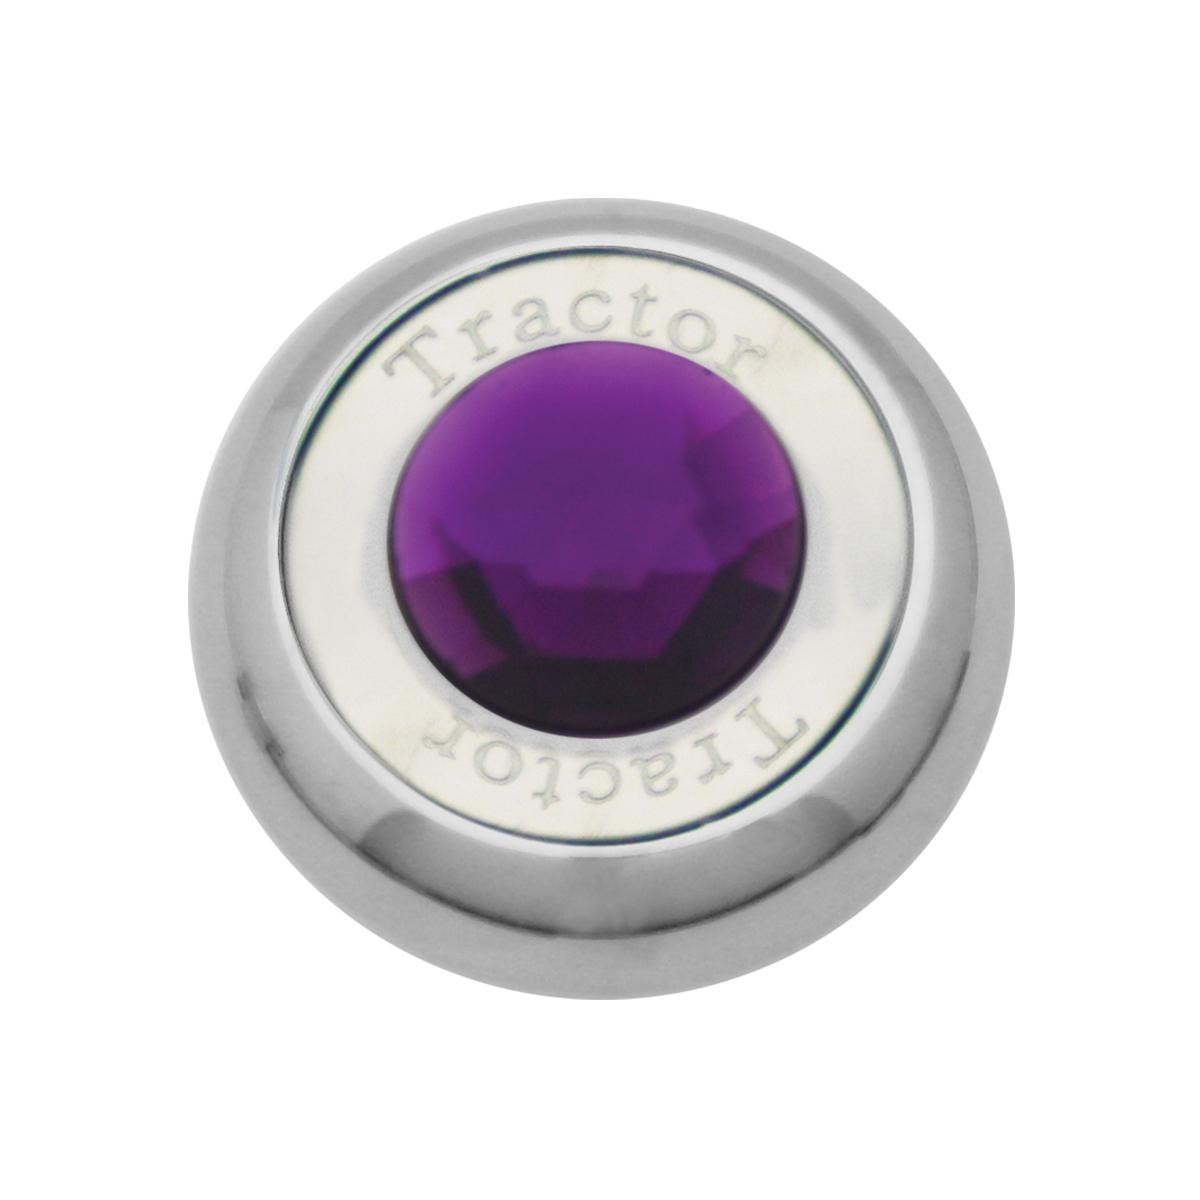 95374 Chrome Screw-In Air Valve Control Knob w/ Crystal